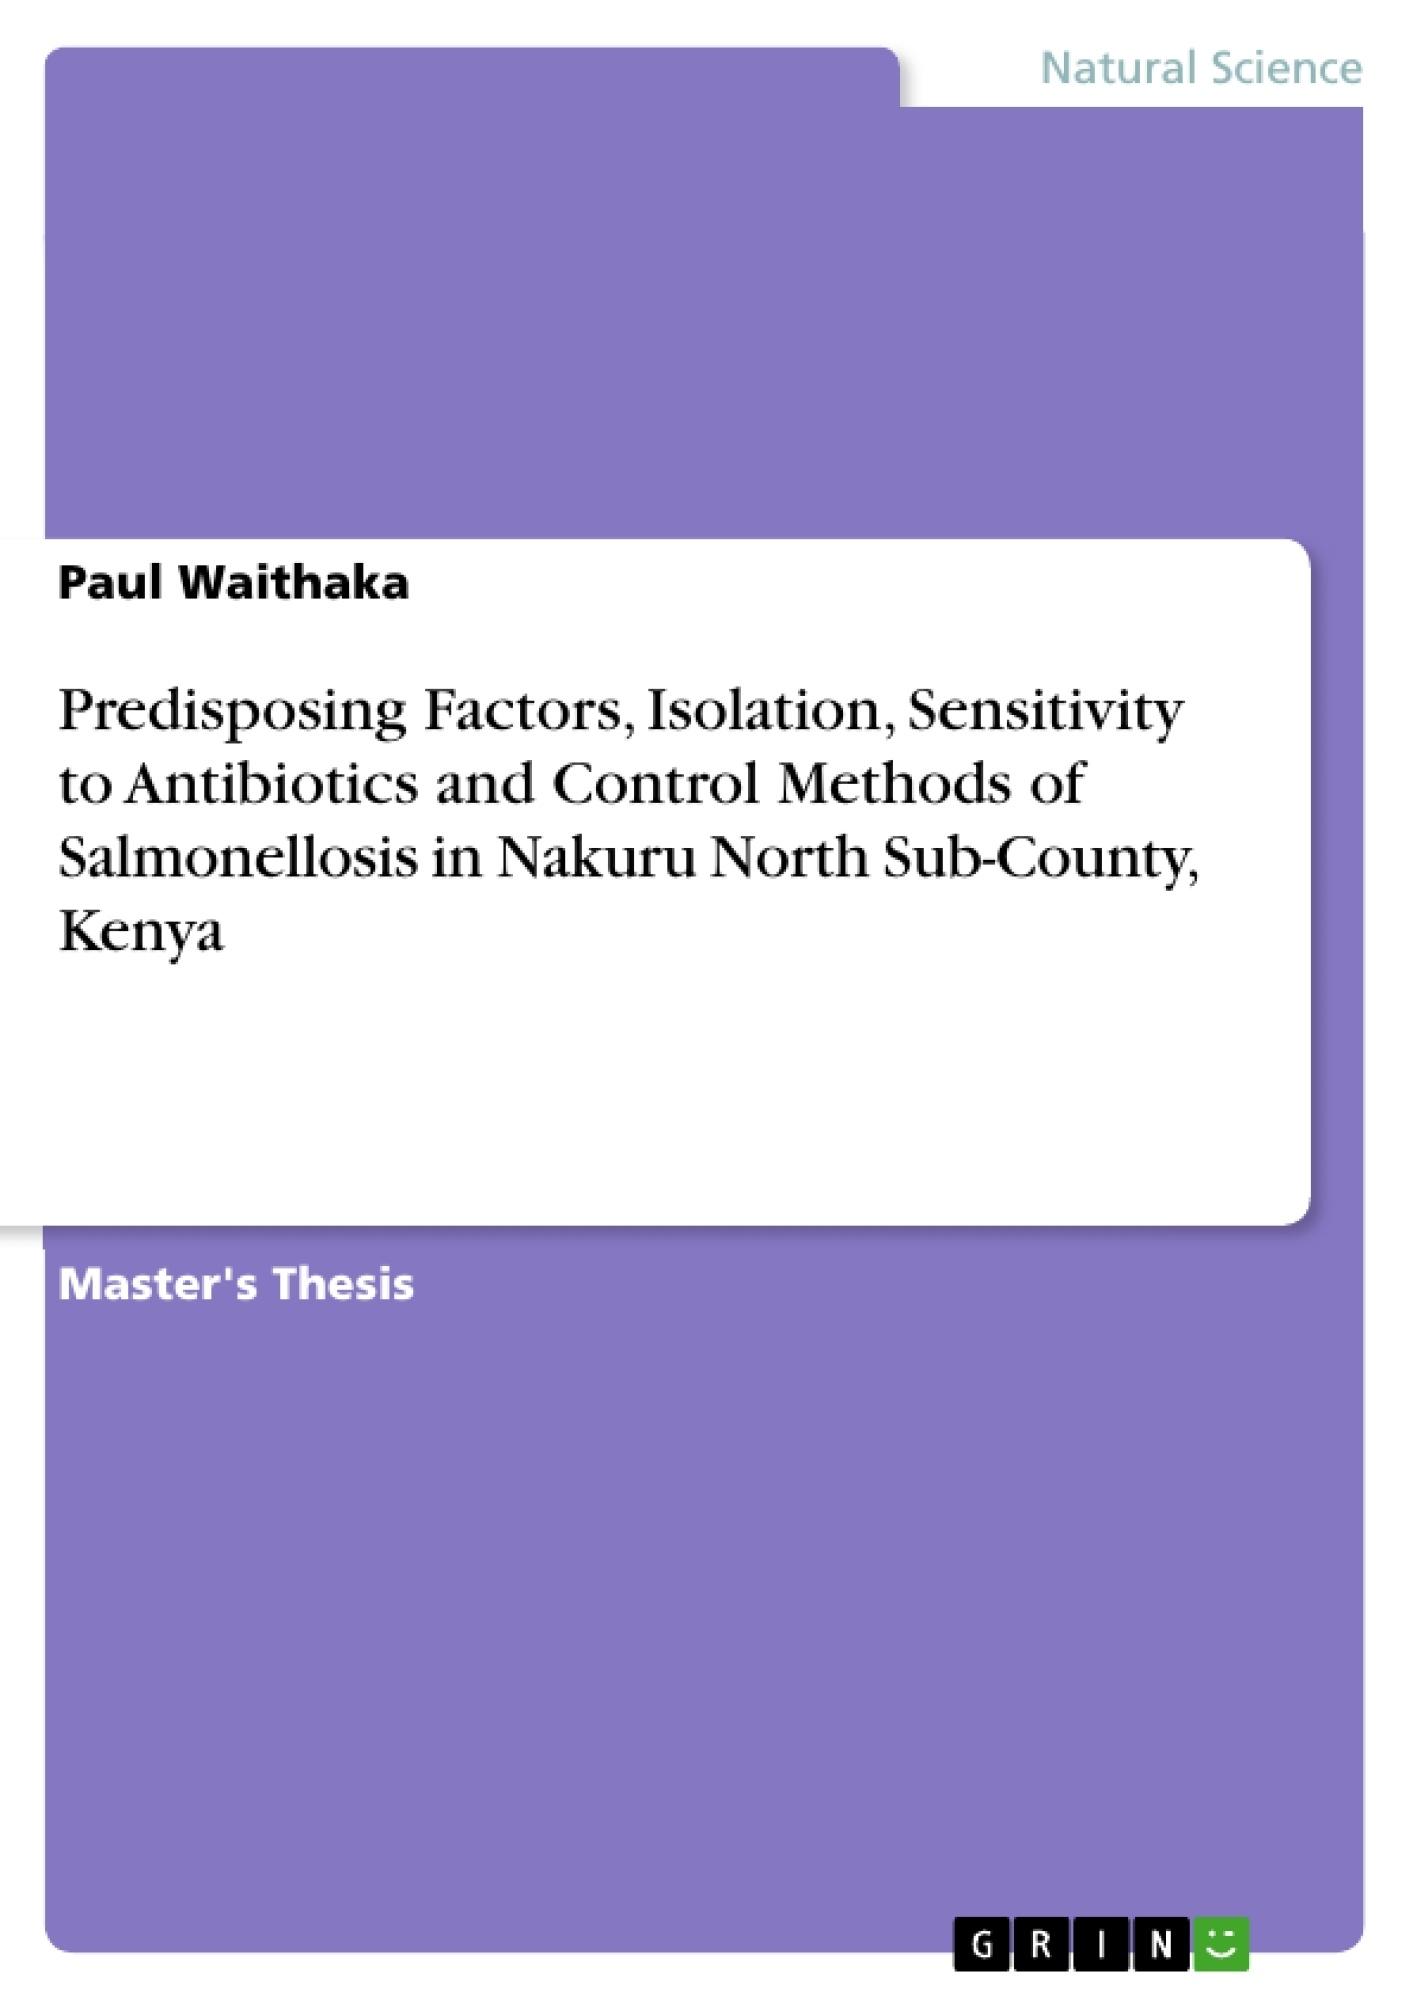 Title: Predisposing Factors, Isolation, Sensitivity to Antibiotics and Control Methods of Salmonellosis in Nakuru North Sub-County, Kenya